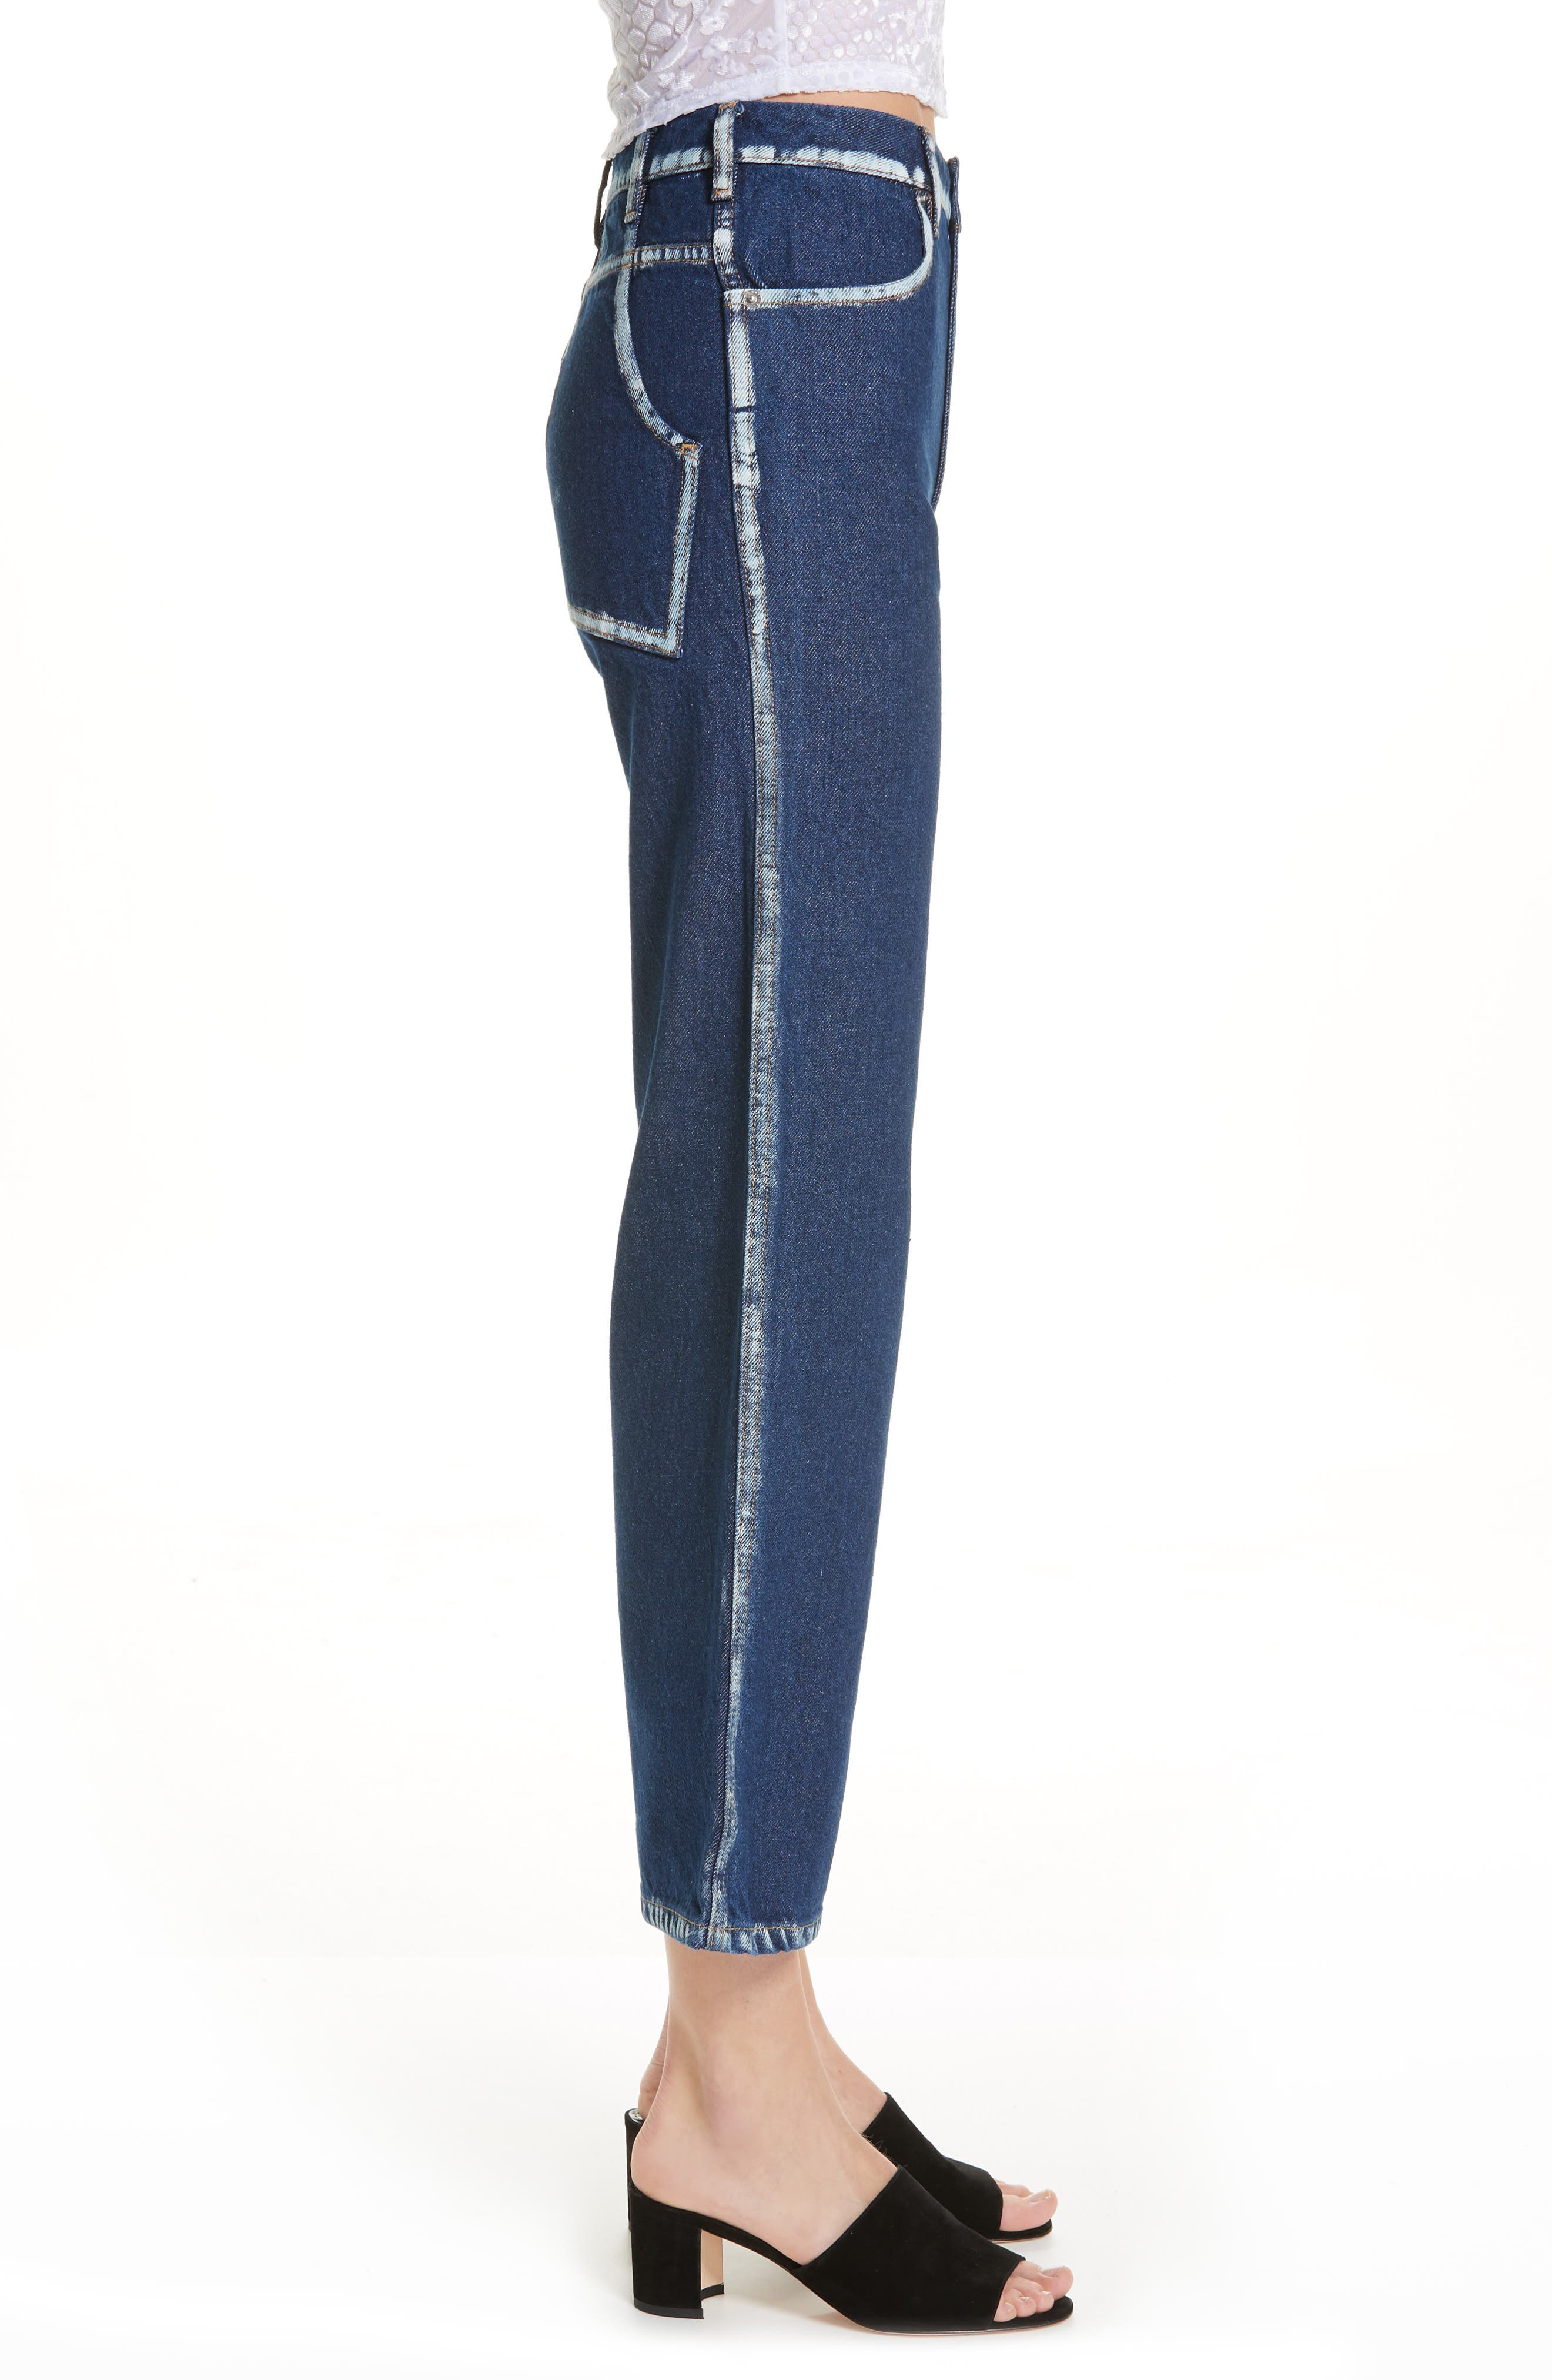 EL Painted Seam Wide Leg Jeans,                             Alternate thumbnail 3, color,                             BLUE SEAM PAINTING